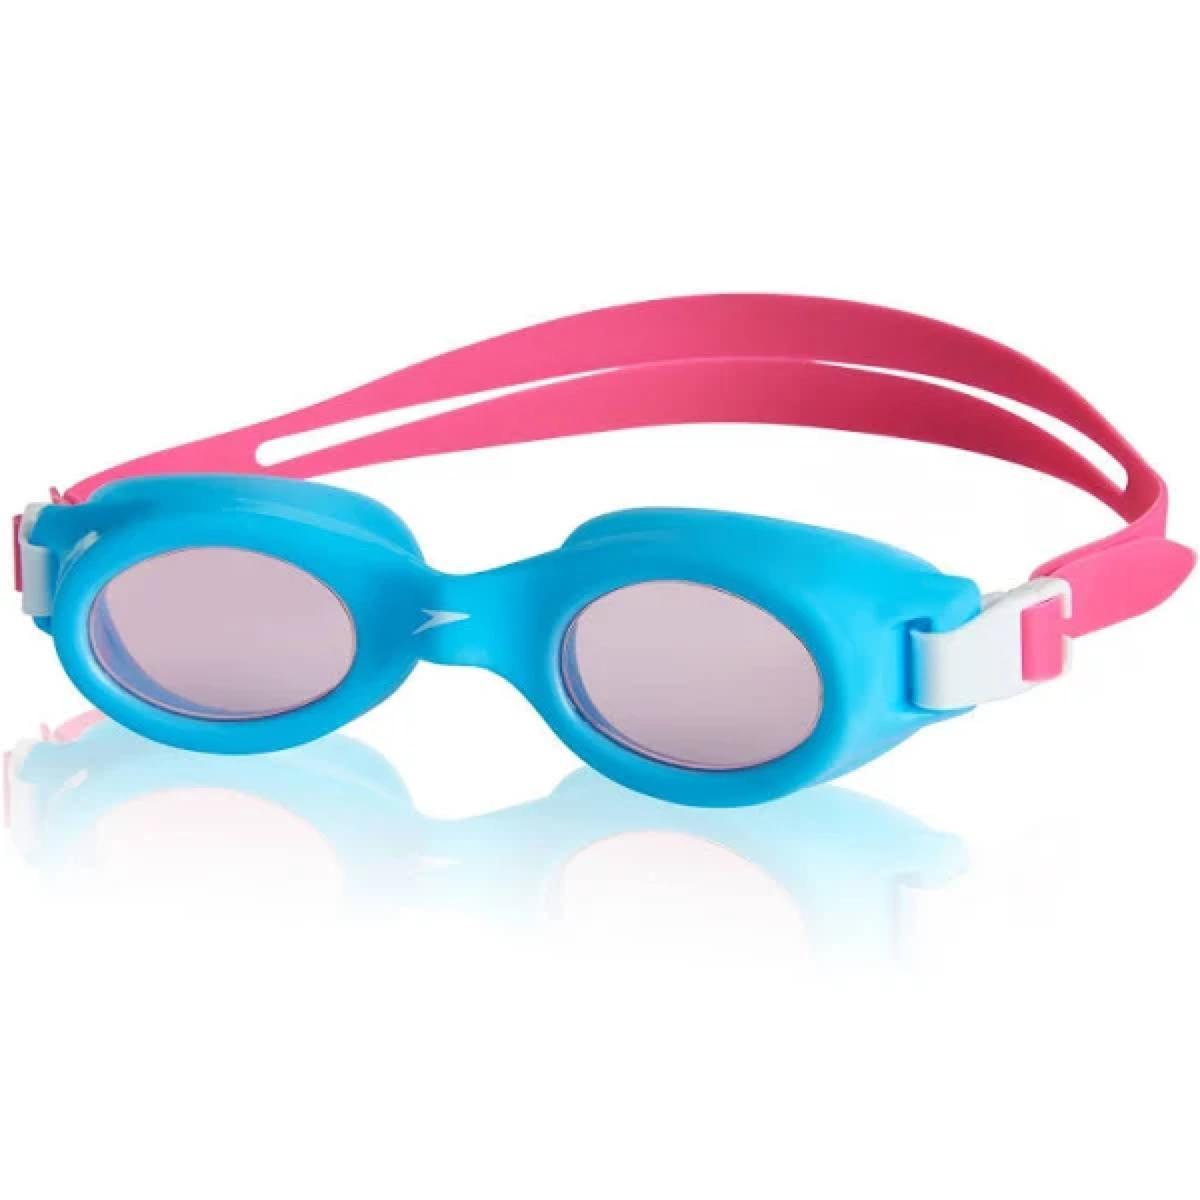 Speedo Glide JR Blue and Pink